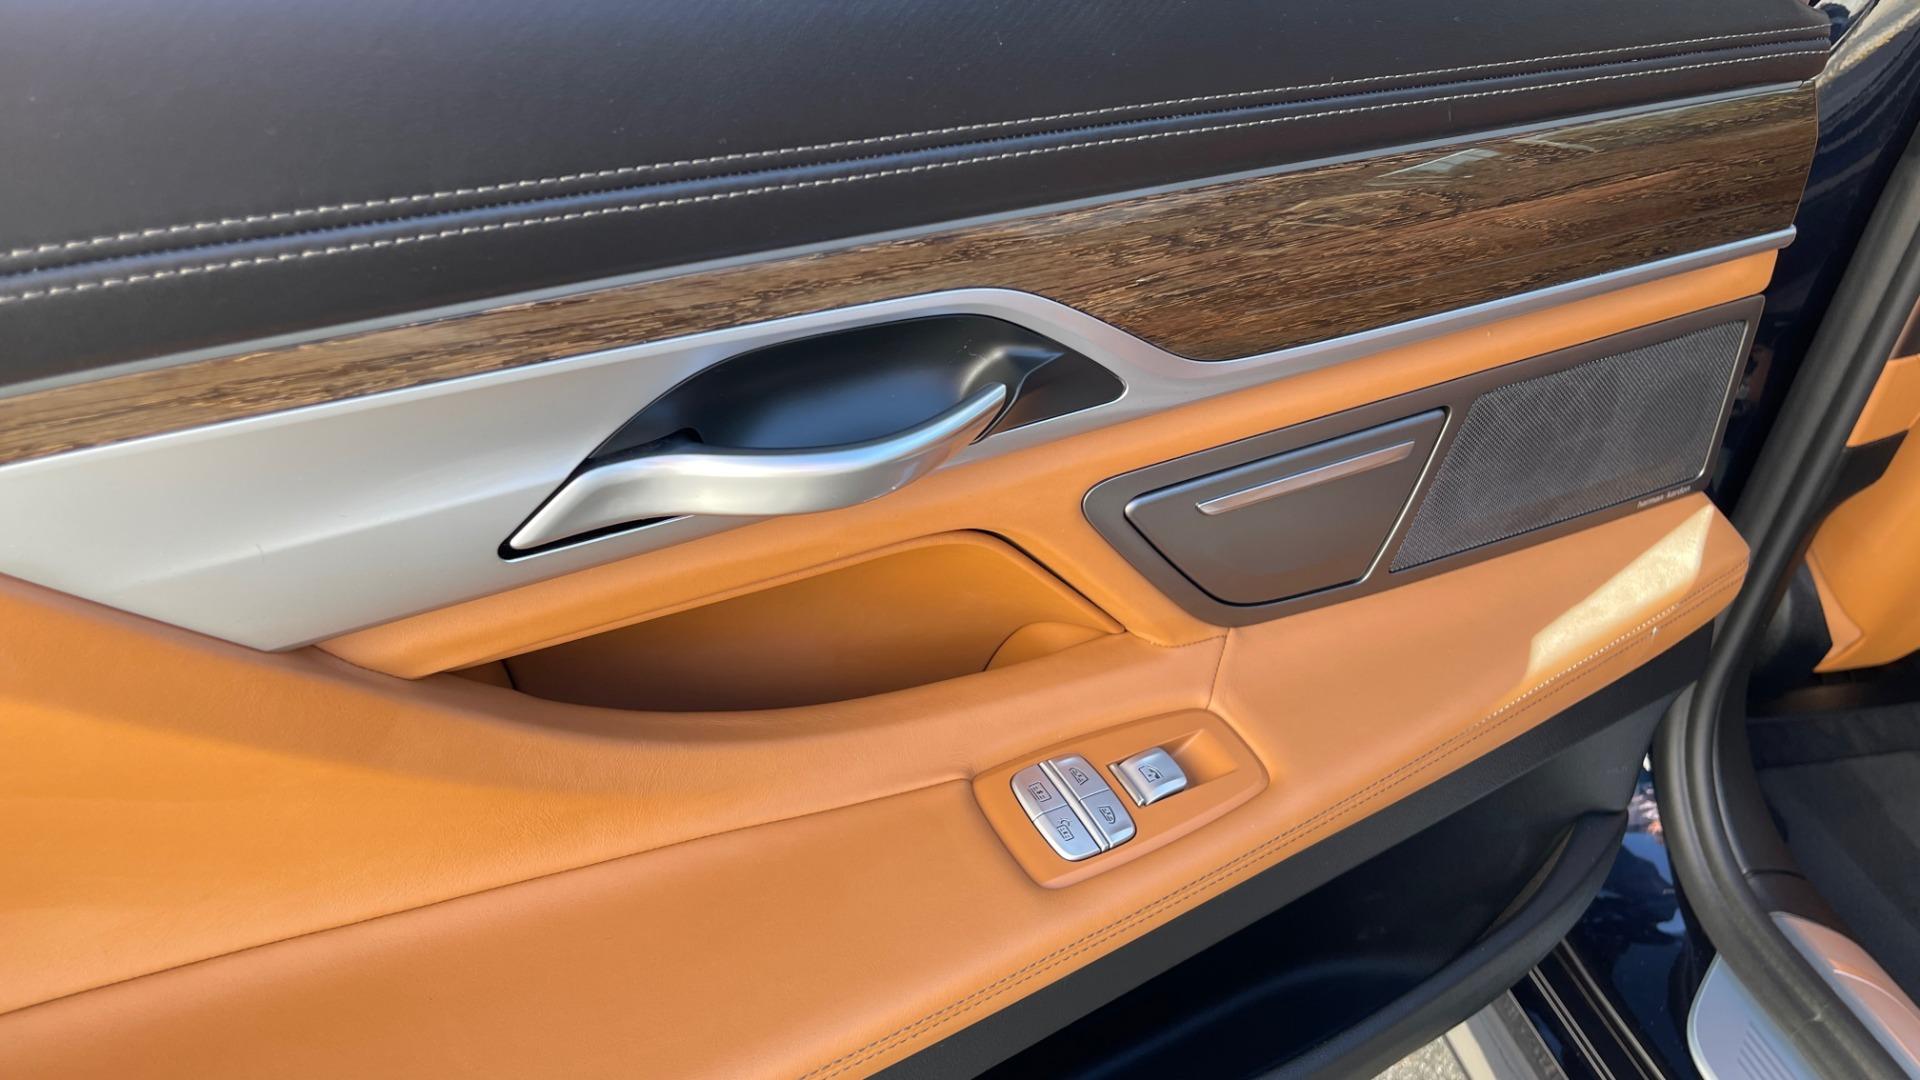 Used 2019 BMW 7 SERIES 750I XDRIVE M-SPORT / EXEC PKG / DRVR ASST PLUS / CLD WTHR / PAR for sale $60,995 at Formula Imports in Charlotte NC 28227 43